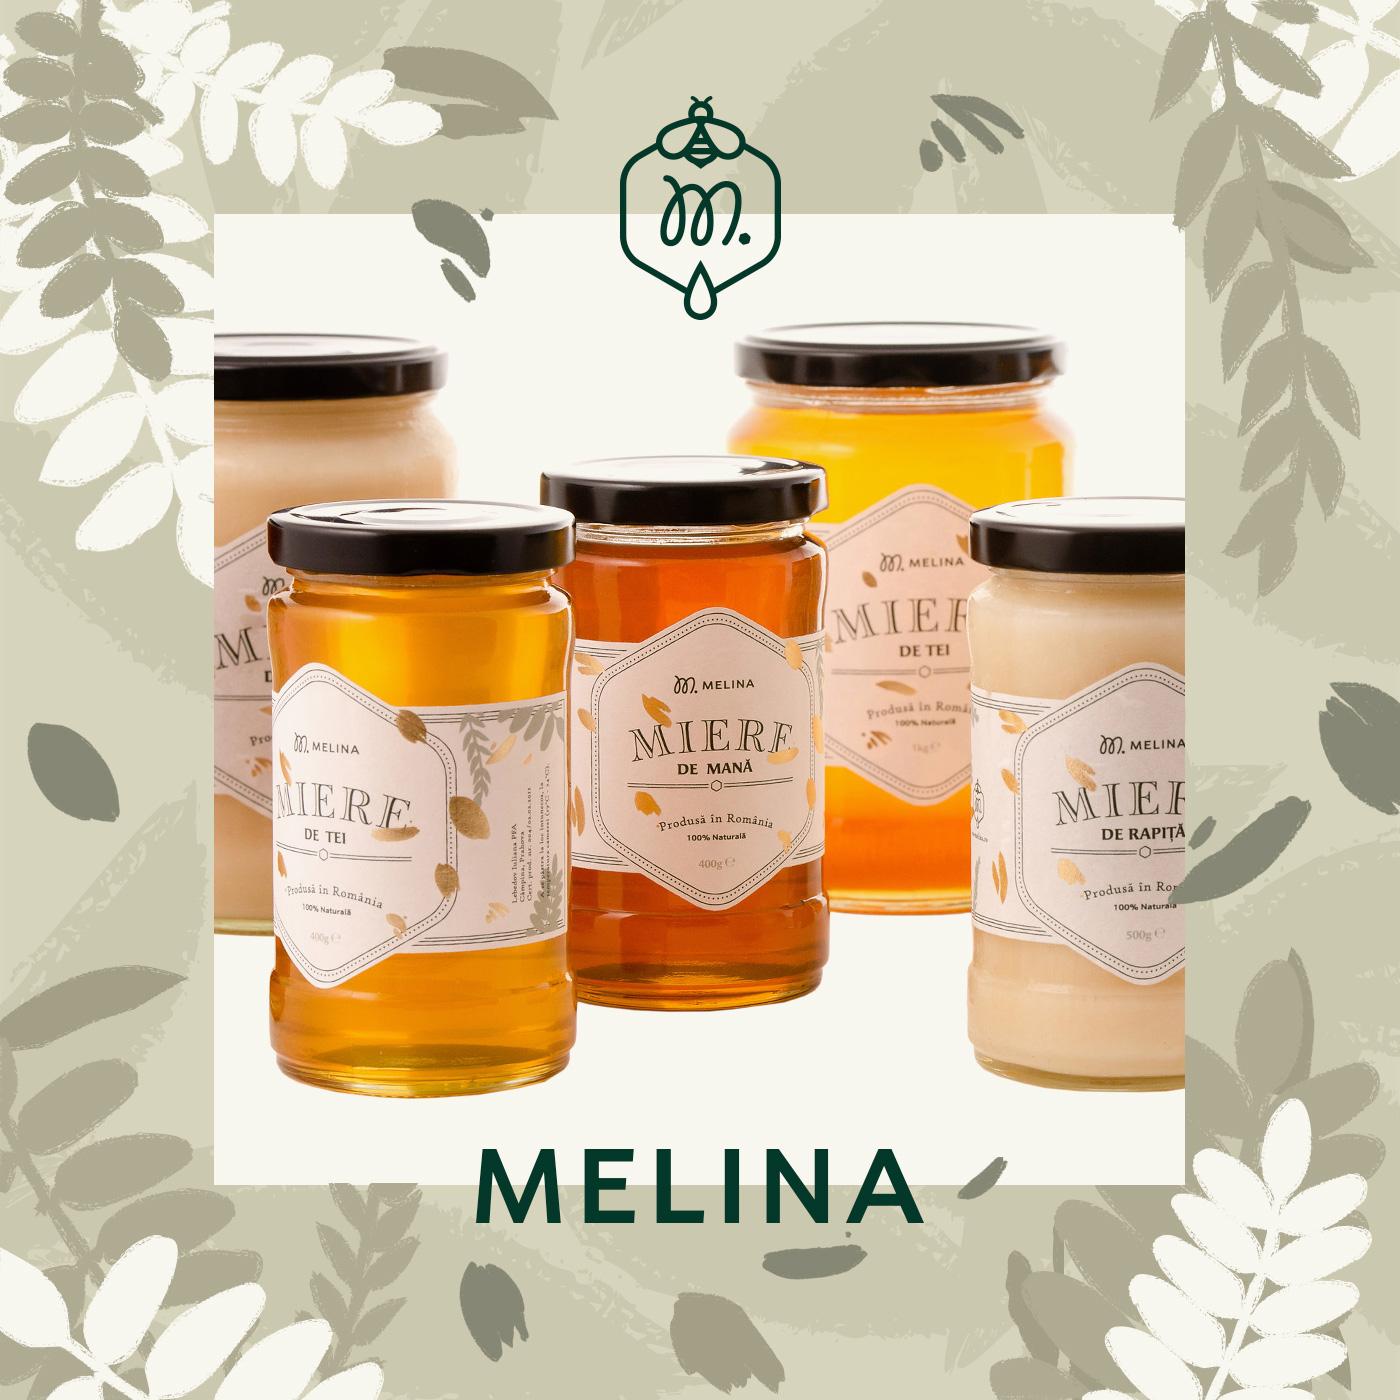 Miere Eco Melina